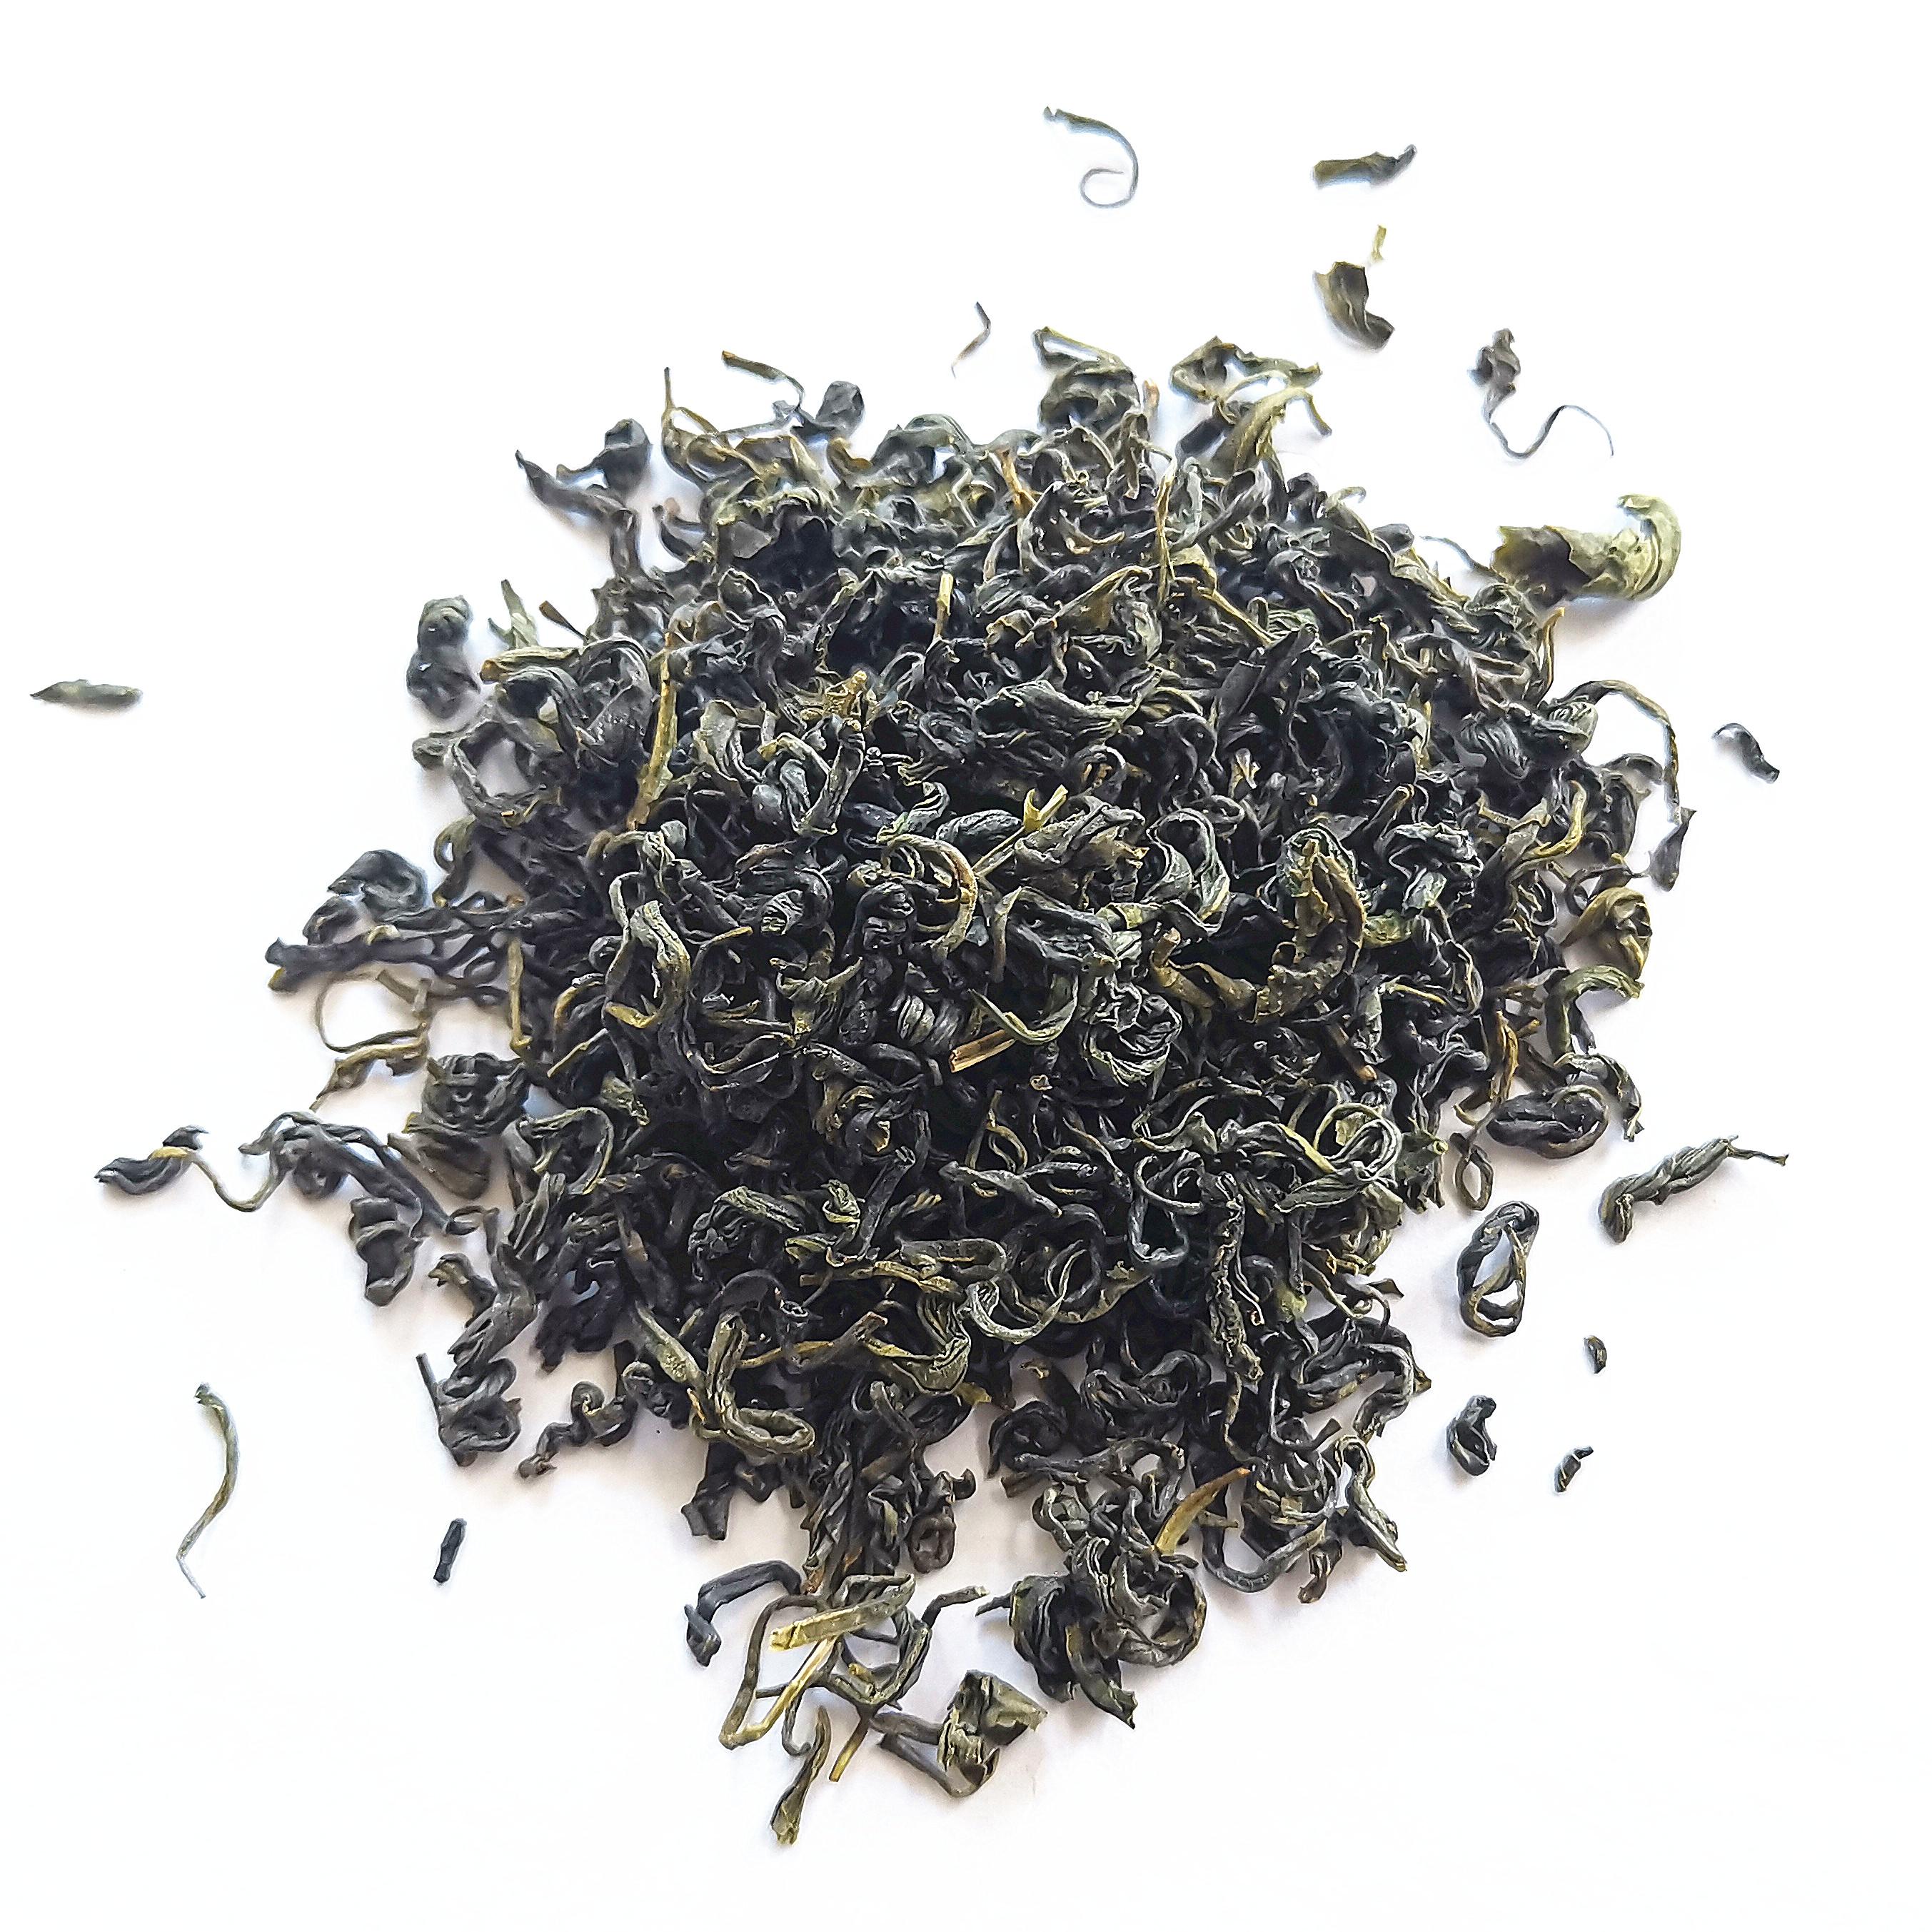 China factory loose tea leaves define tea green - 4uTea | 4uTea.com